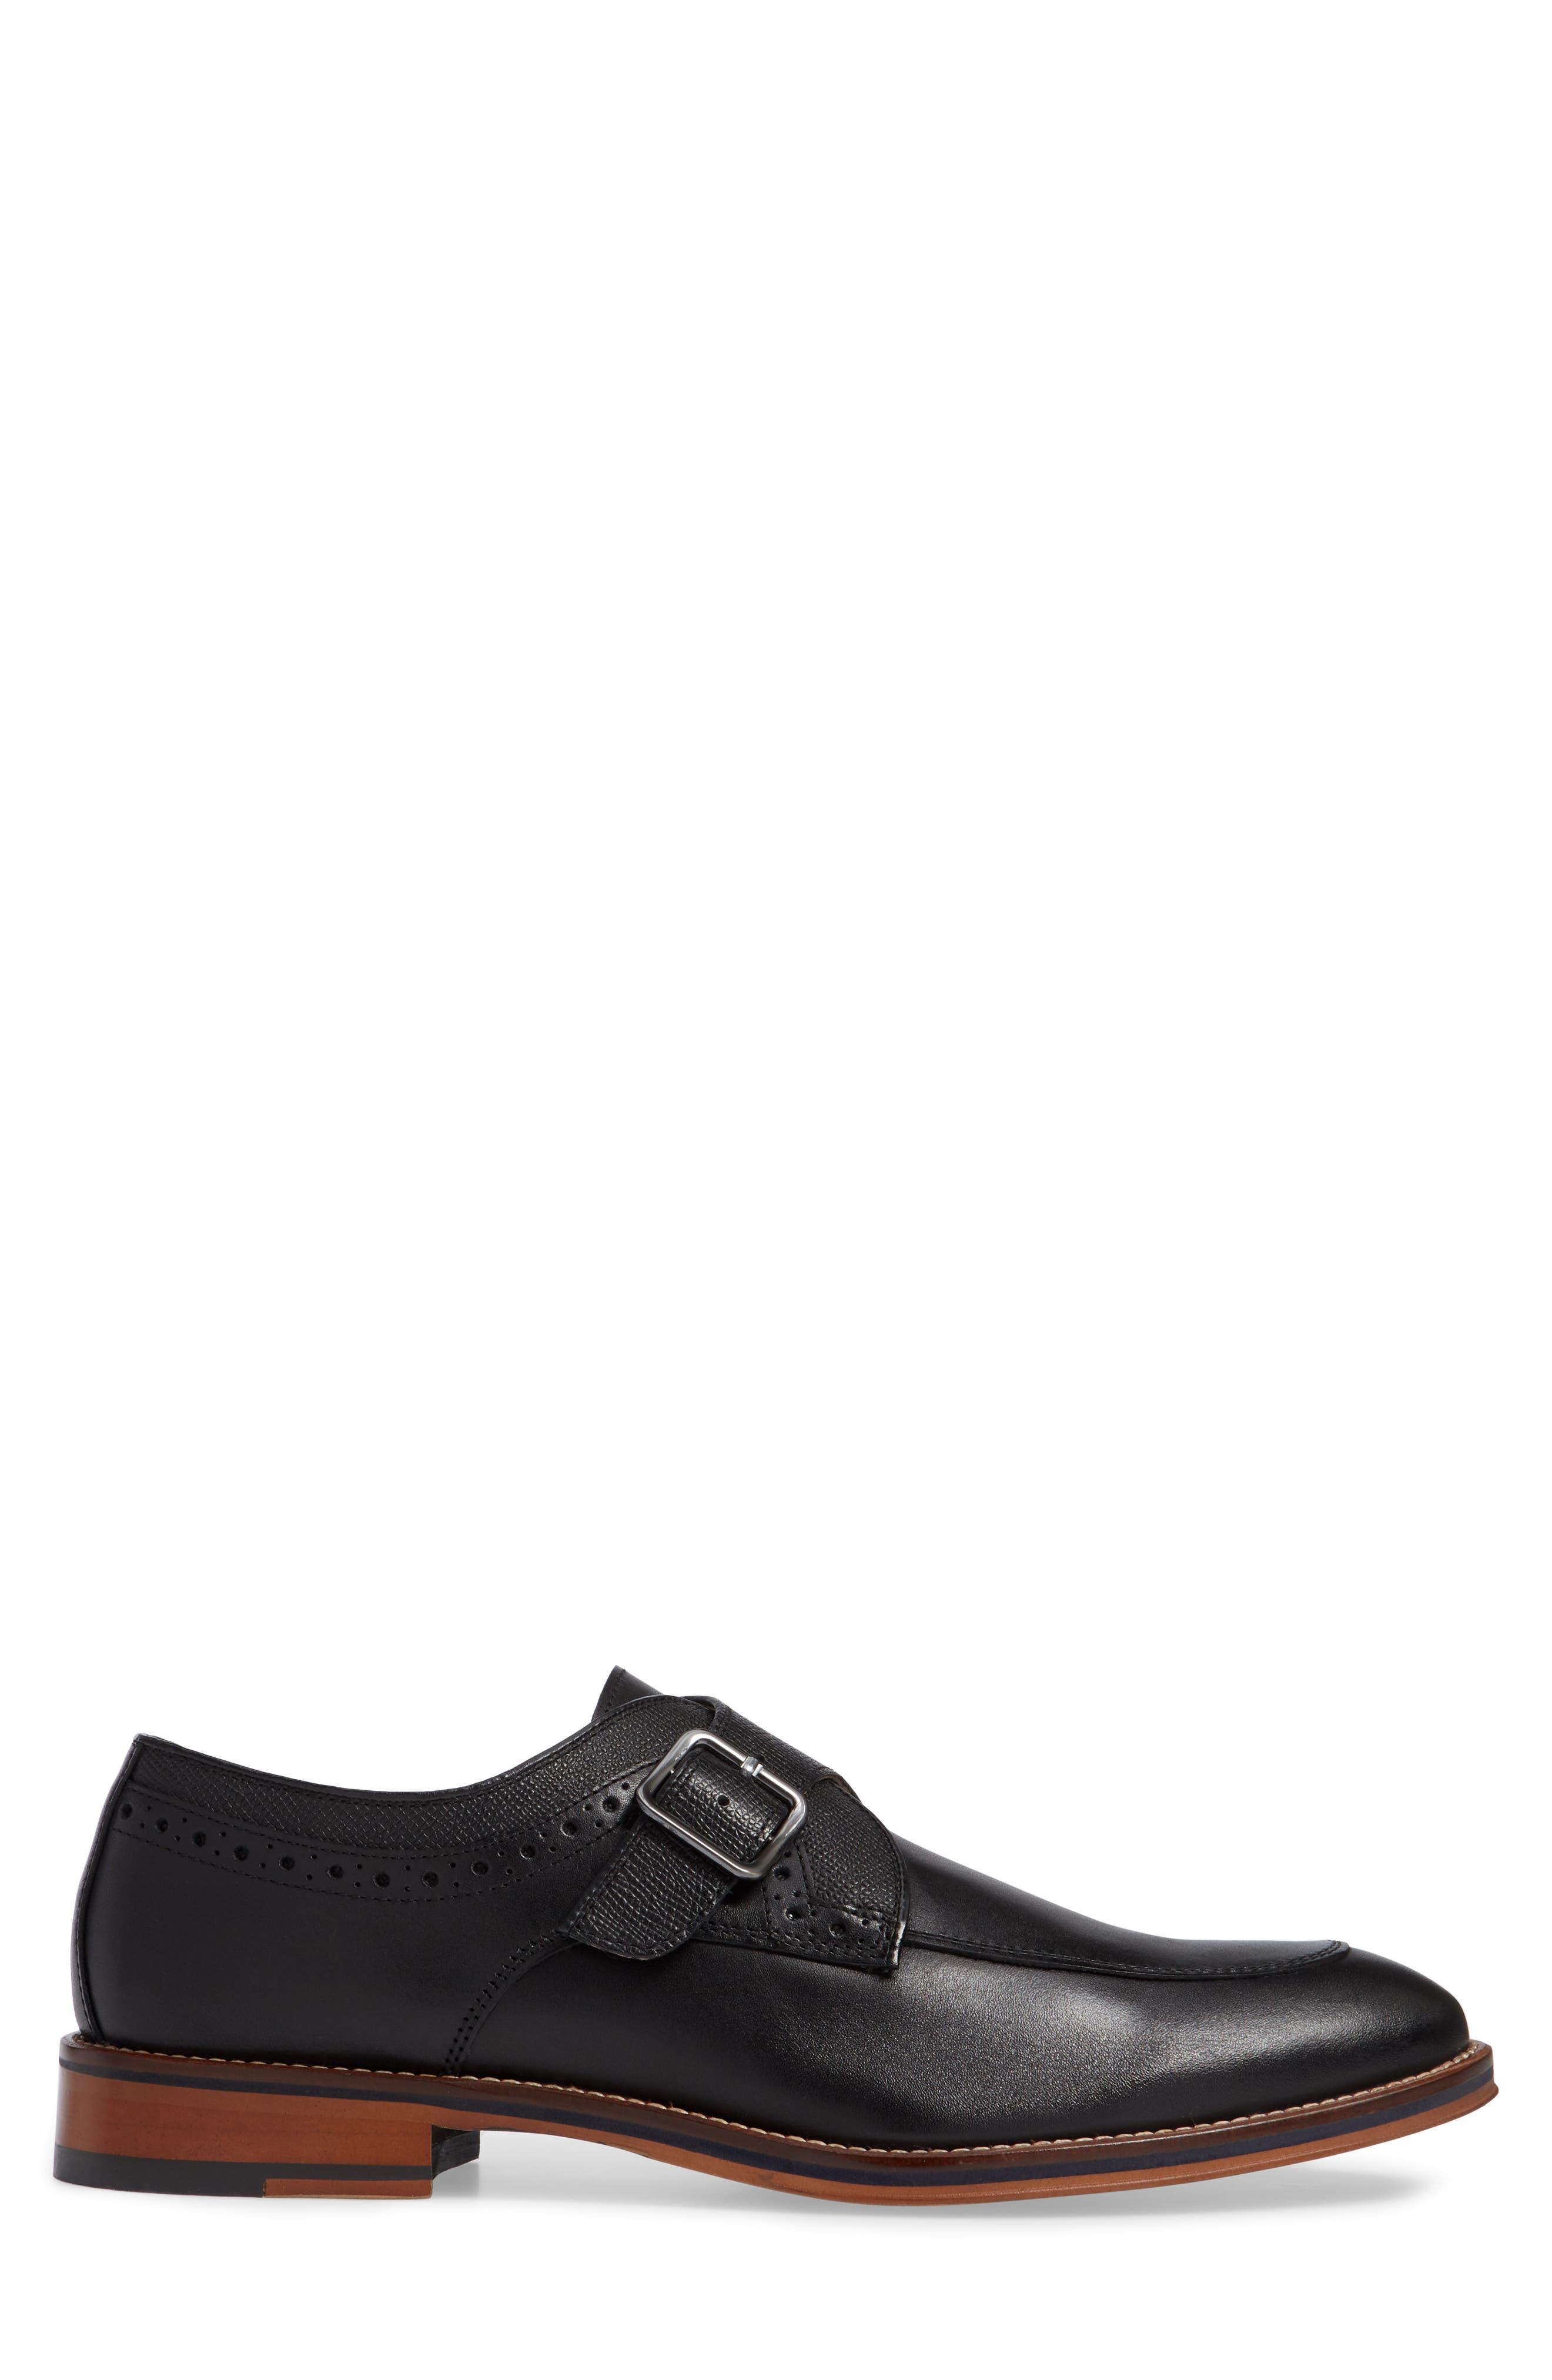 JOHNSTON & MURPHY, Conard Monk Strap Shoe, Alternate thumbnail 3, color, BLACK LEATHER